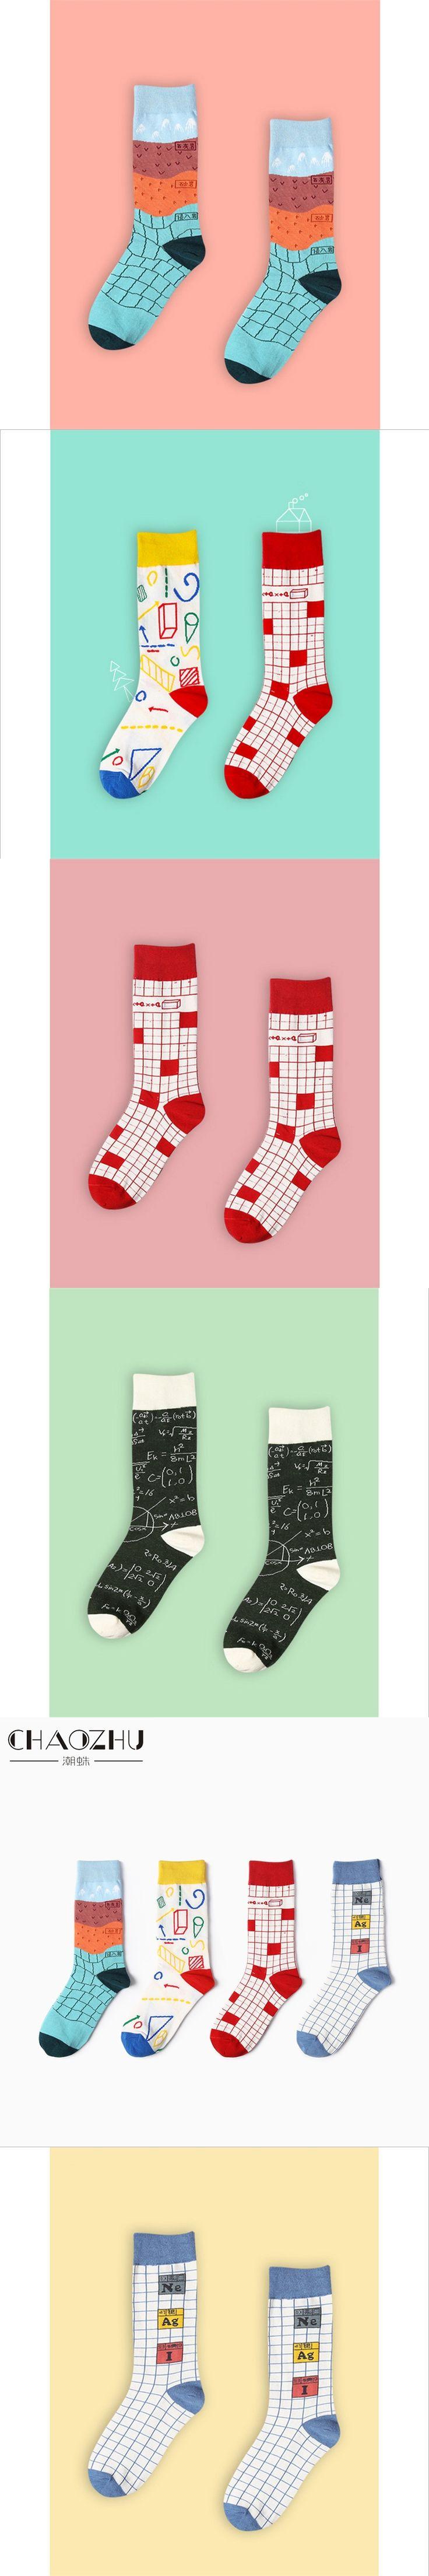 2017 Students Socks Novel Funny Textbook Graffiti Boys Girls Over The Calf Socks Cotton Autumn Winter Casual Skate Genius Sock